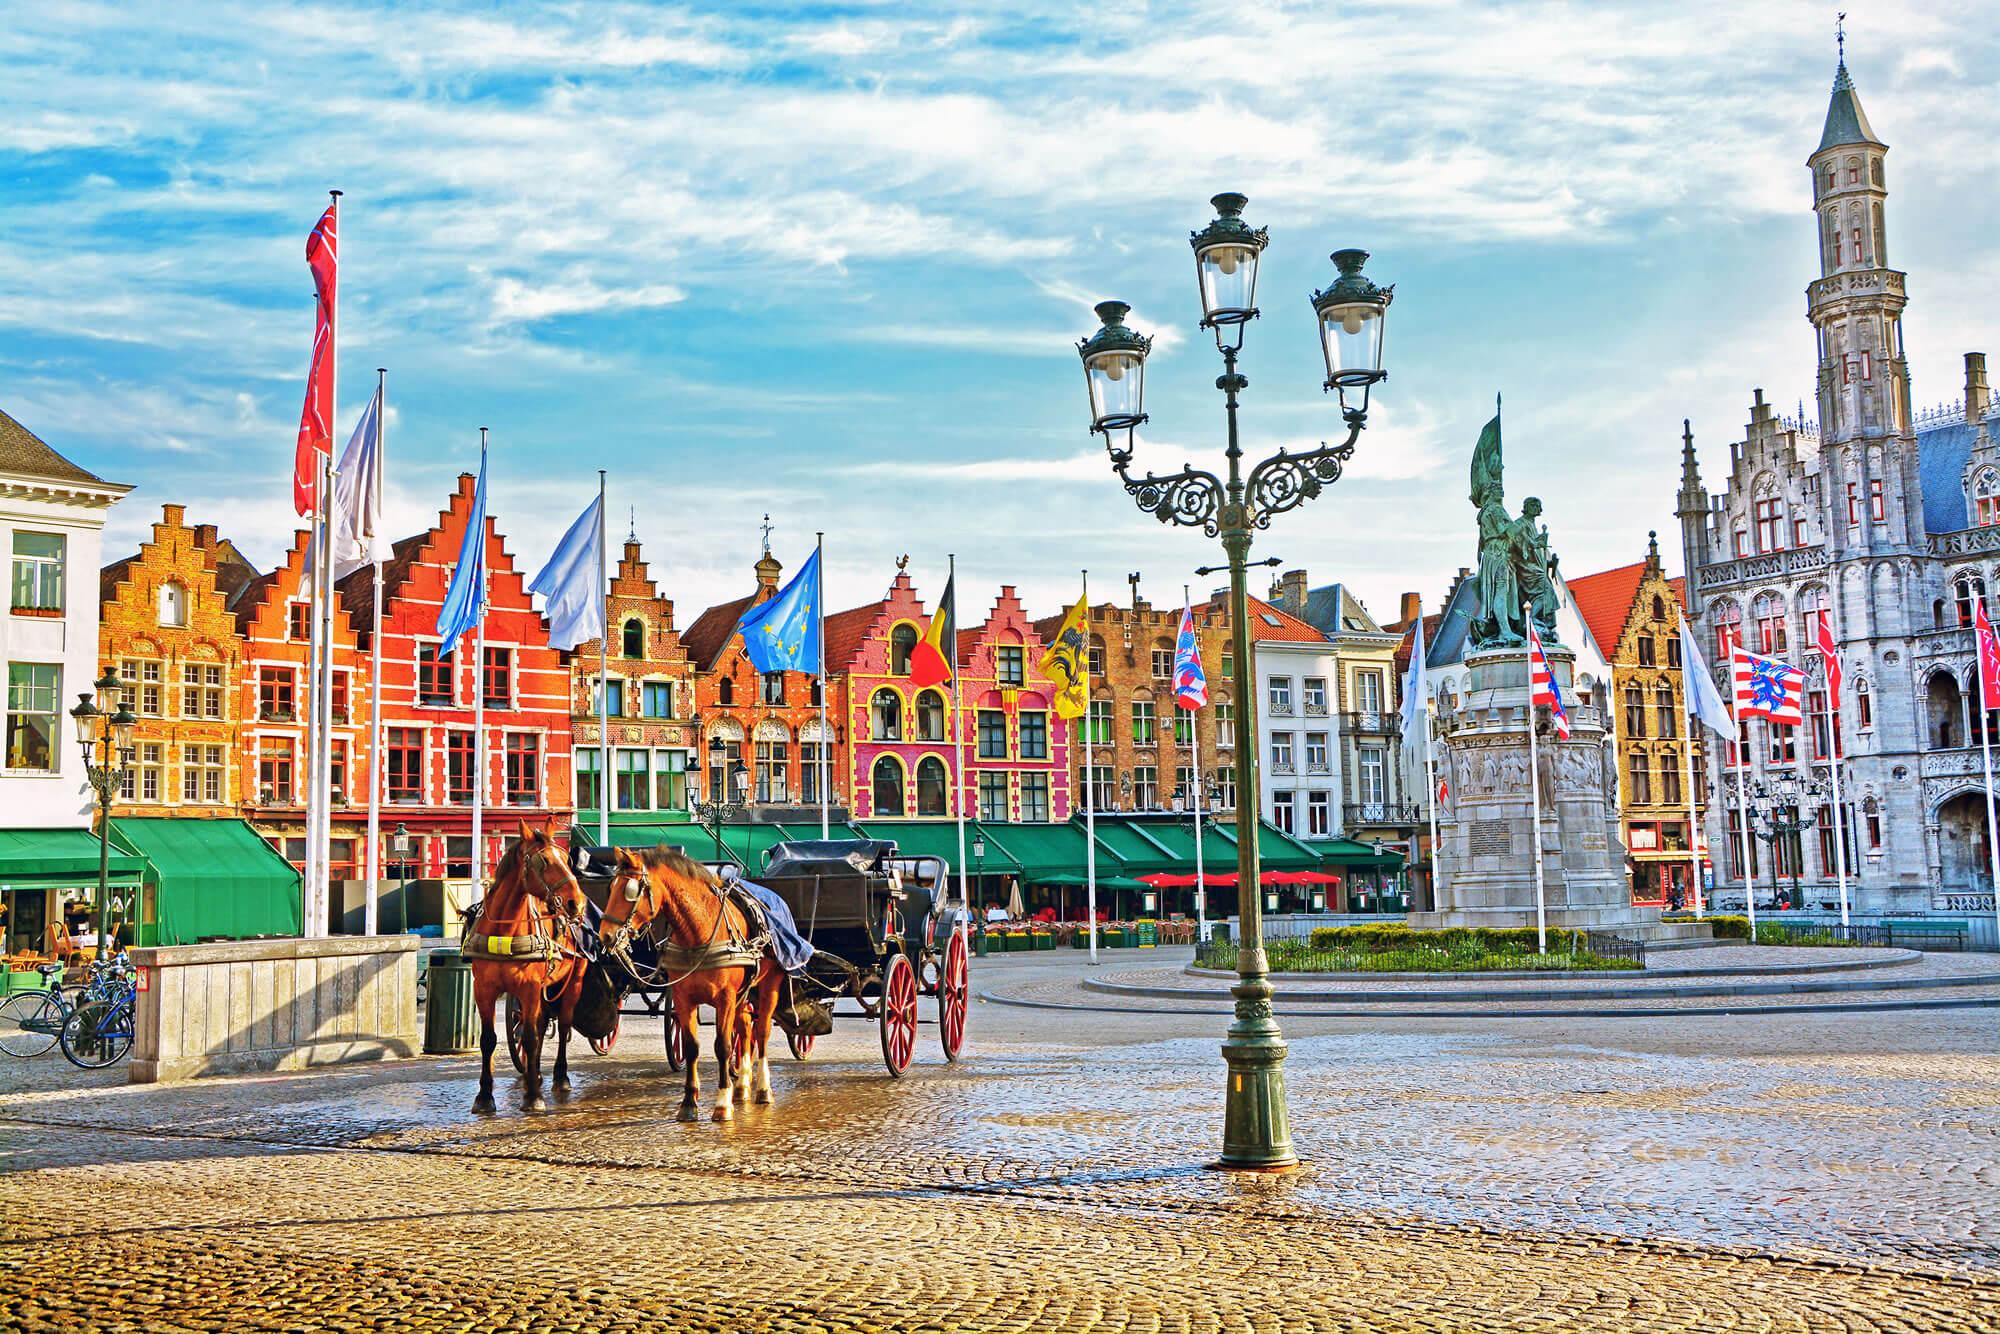 Grote Markt Square, Brugge